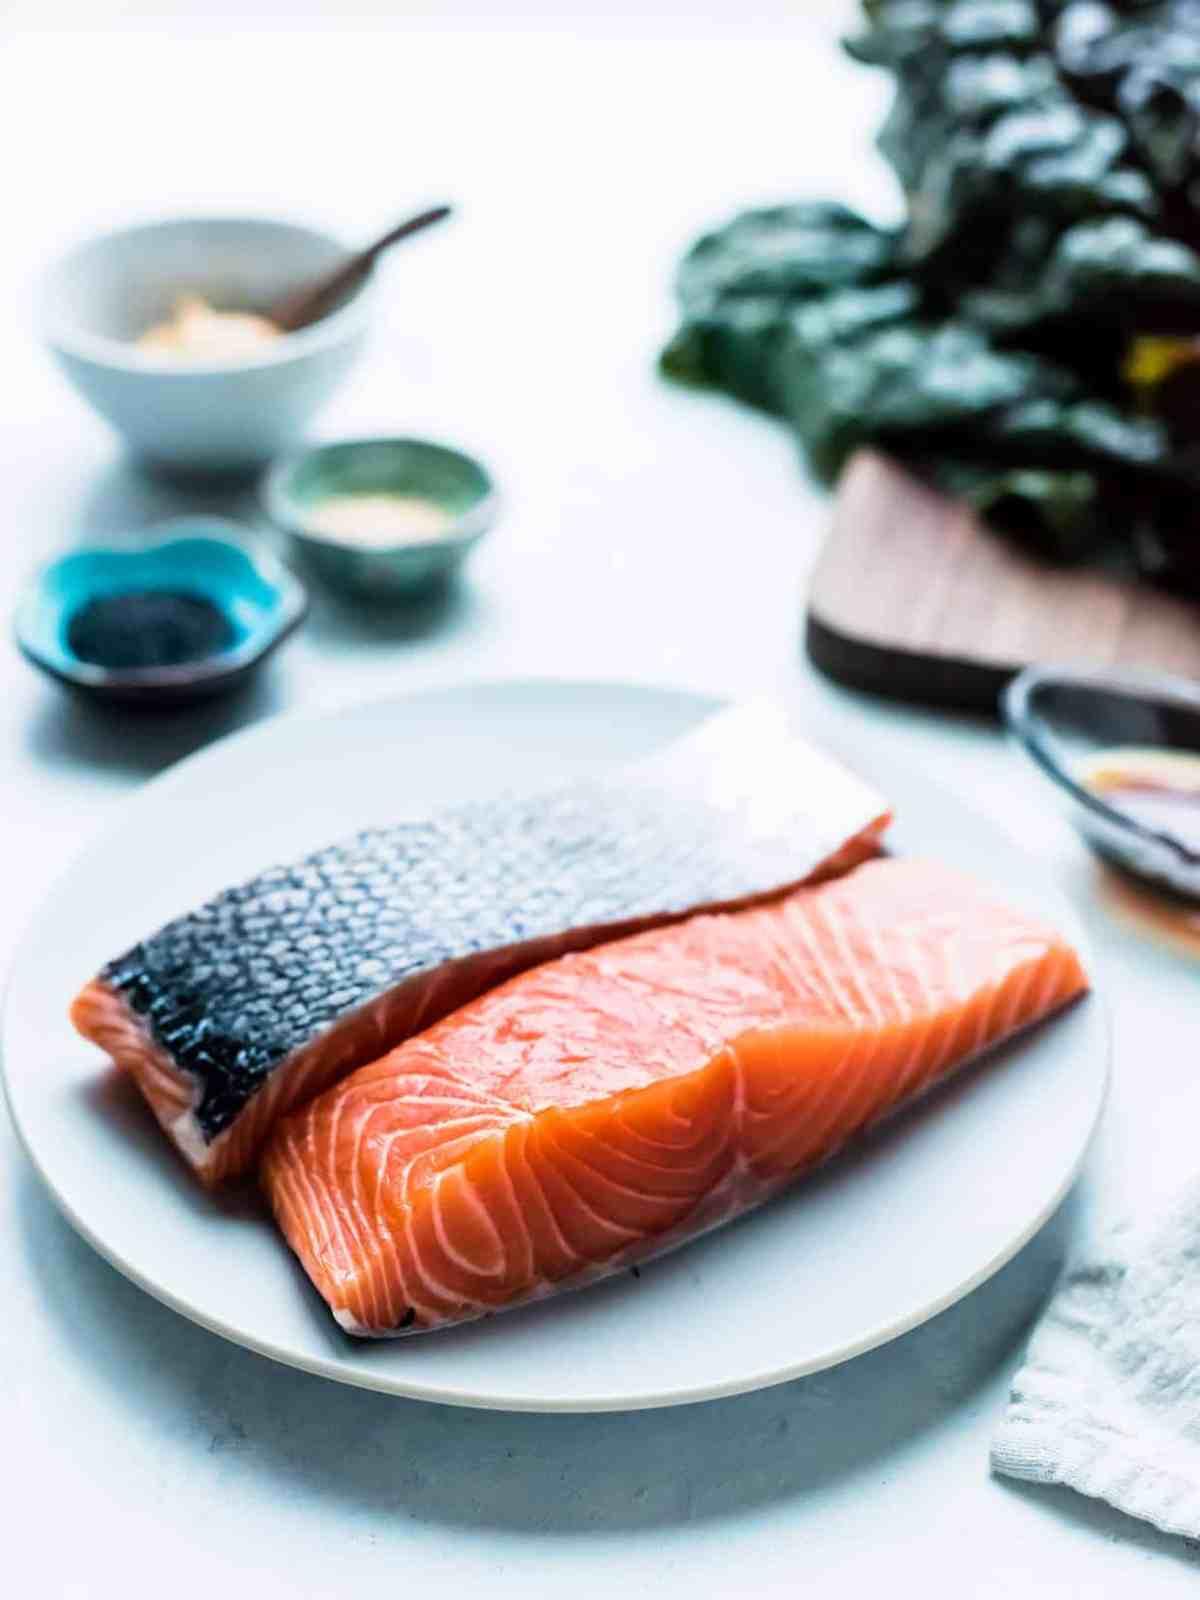 Raw salmon ready to sear for Miso Maple Glazed Salmon.